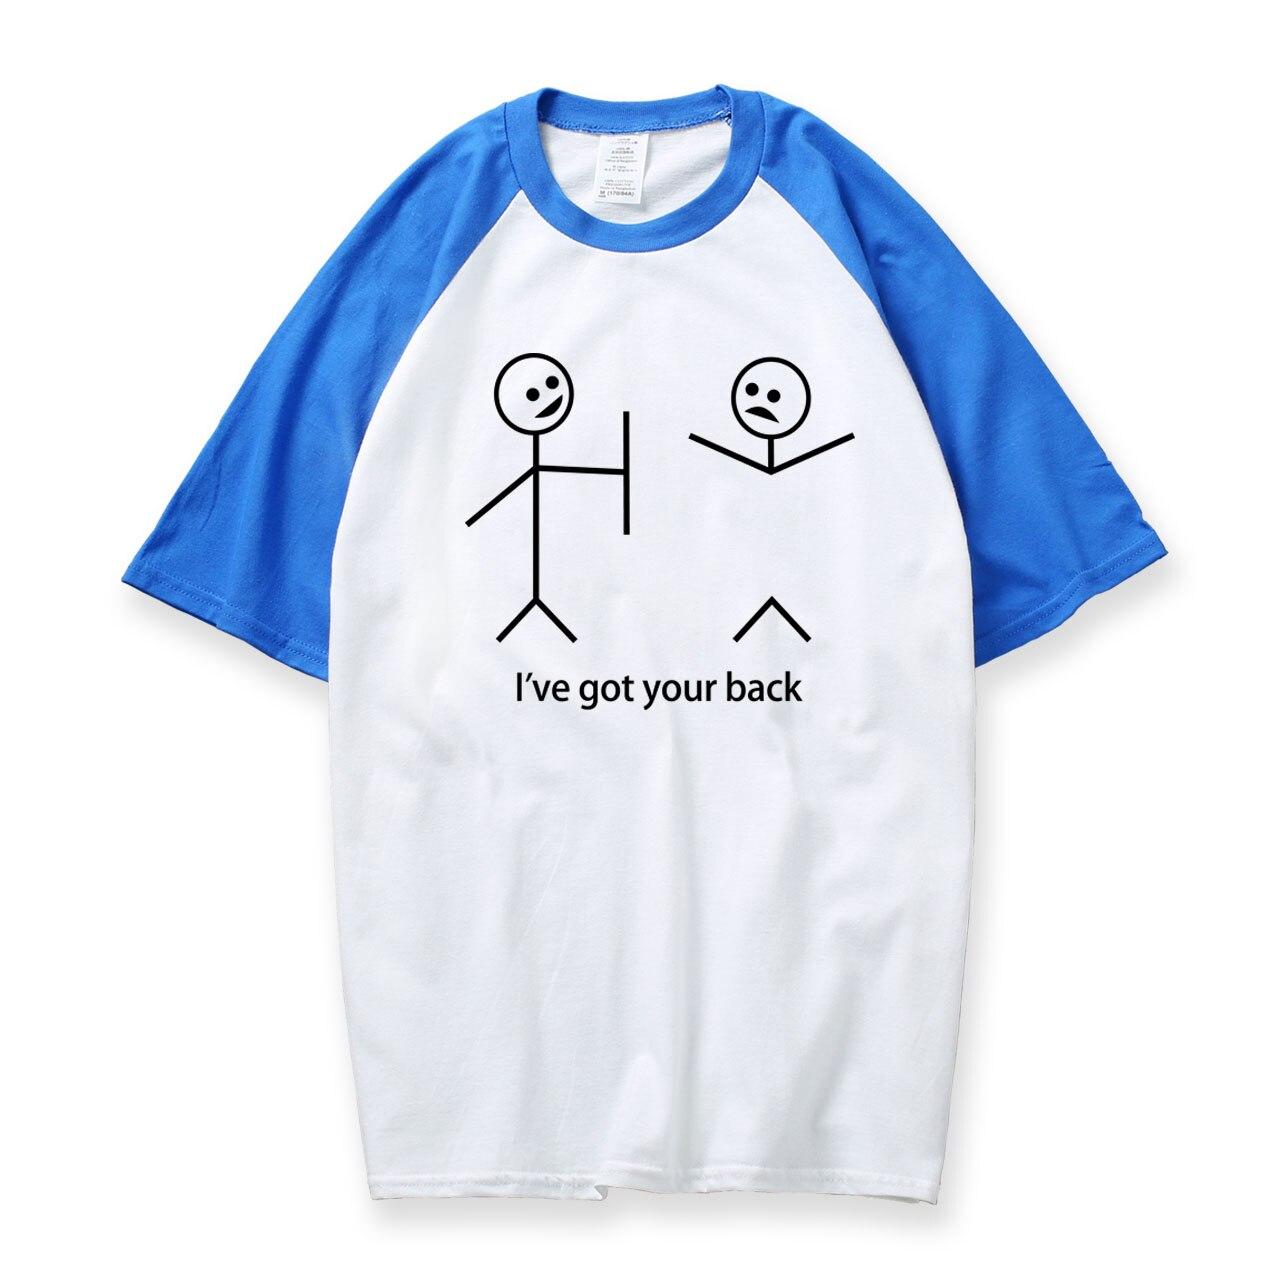 New 2018 Summer Raglan Men Best Friend T Shirts Cute Pattern Funny Stick Figure T Shirt Short Sleeve Tops Tshirt Boyfriend Tops